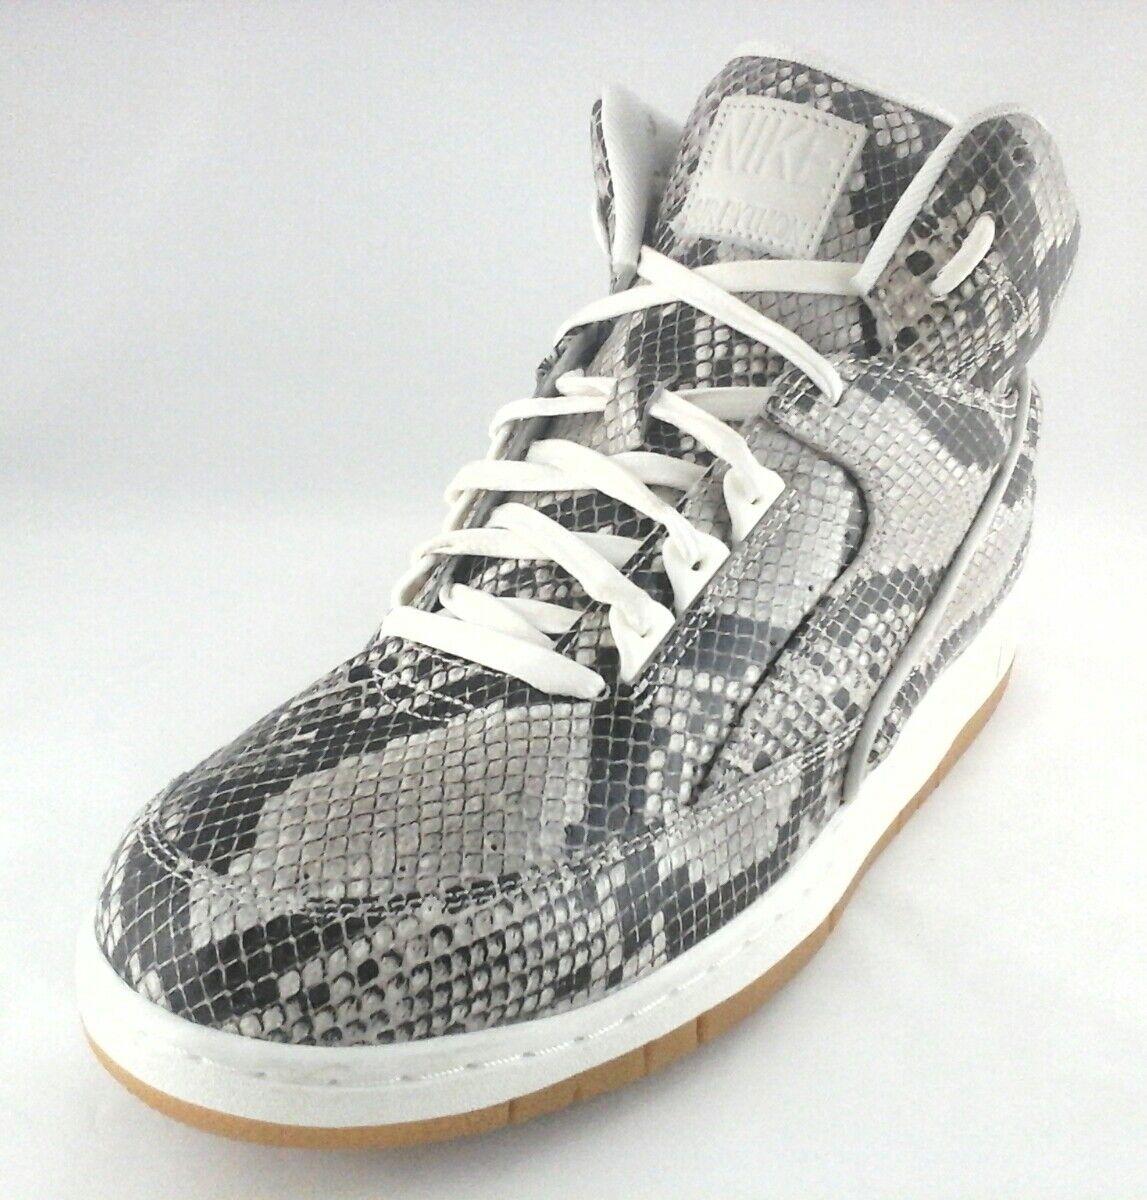 Nike Air  705066-201 Python Premium Mens Cream Snakeskin Print Gum Shoes 11.5